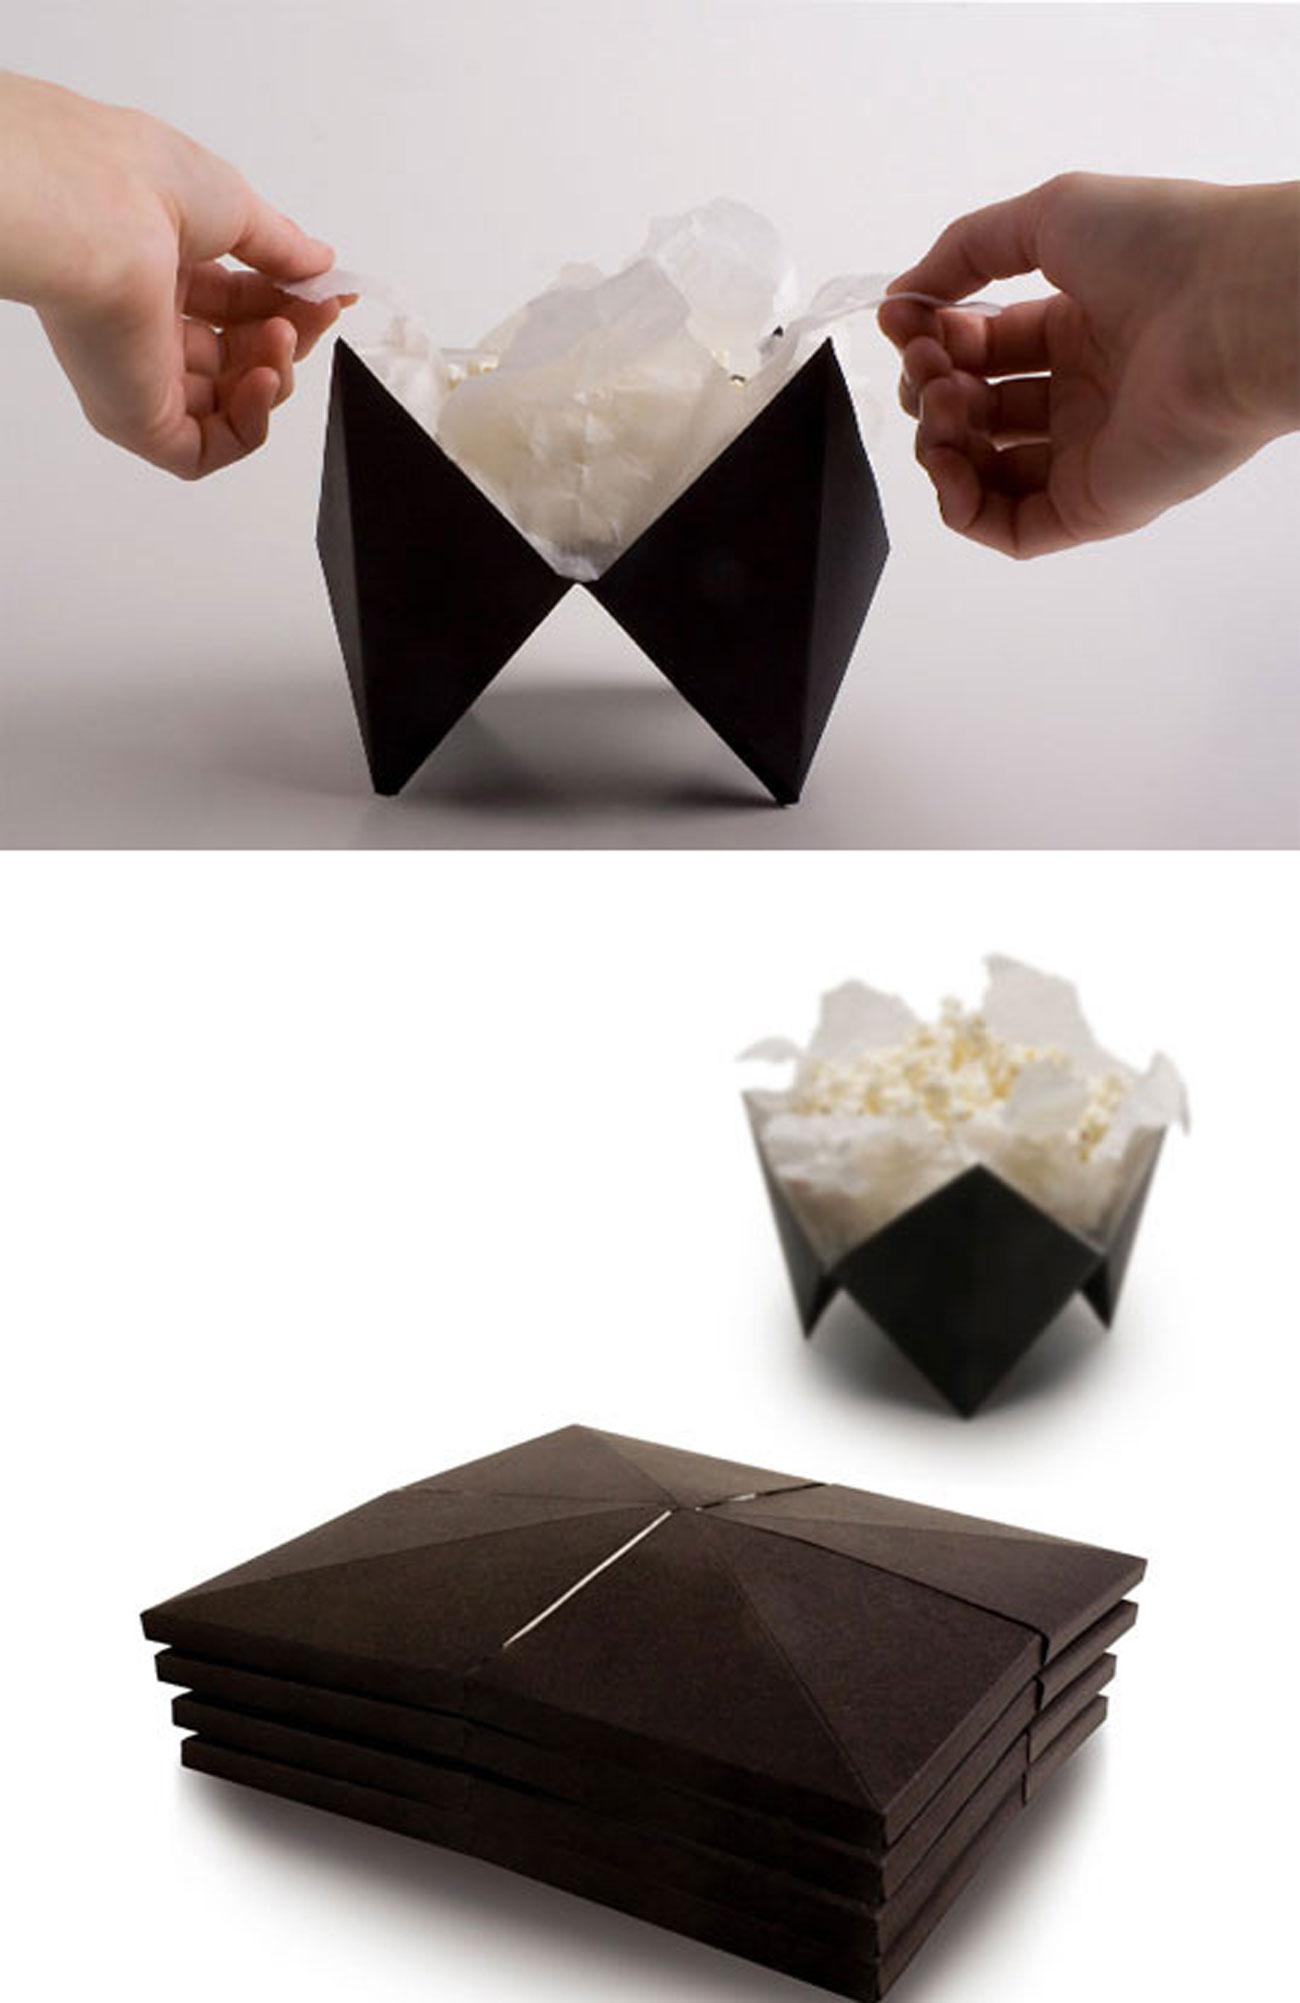 origami-microwave-popcorn-packlab